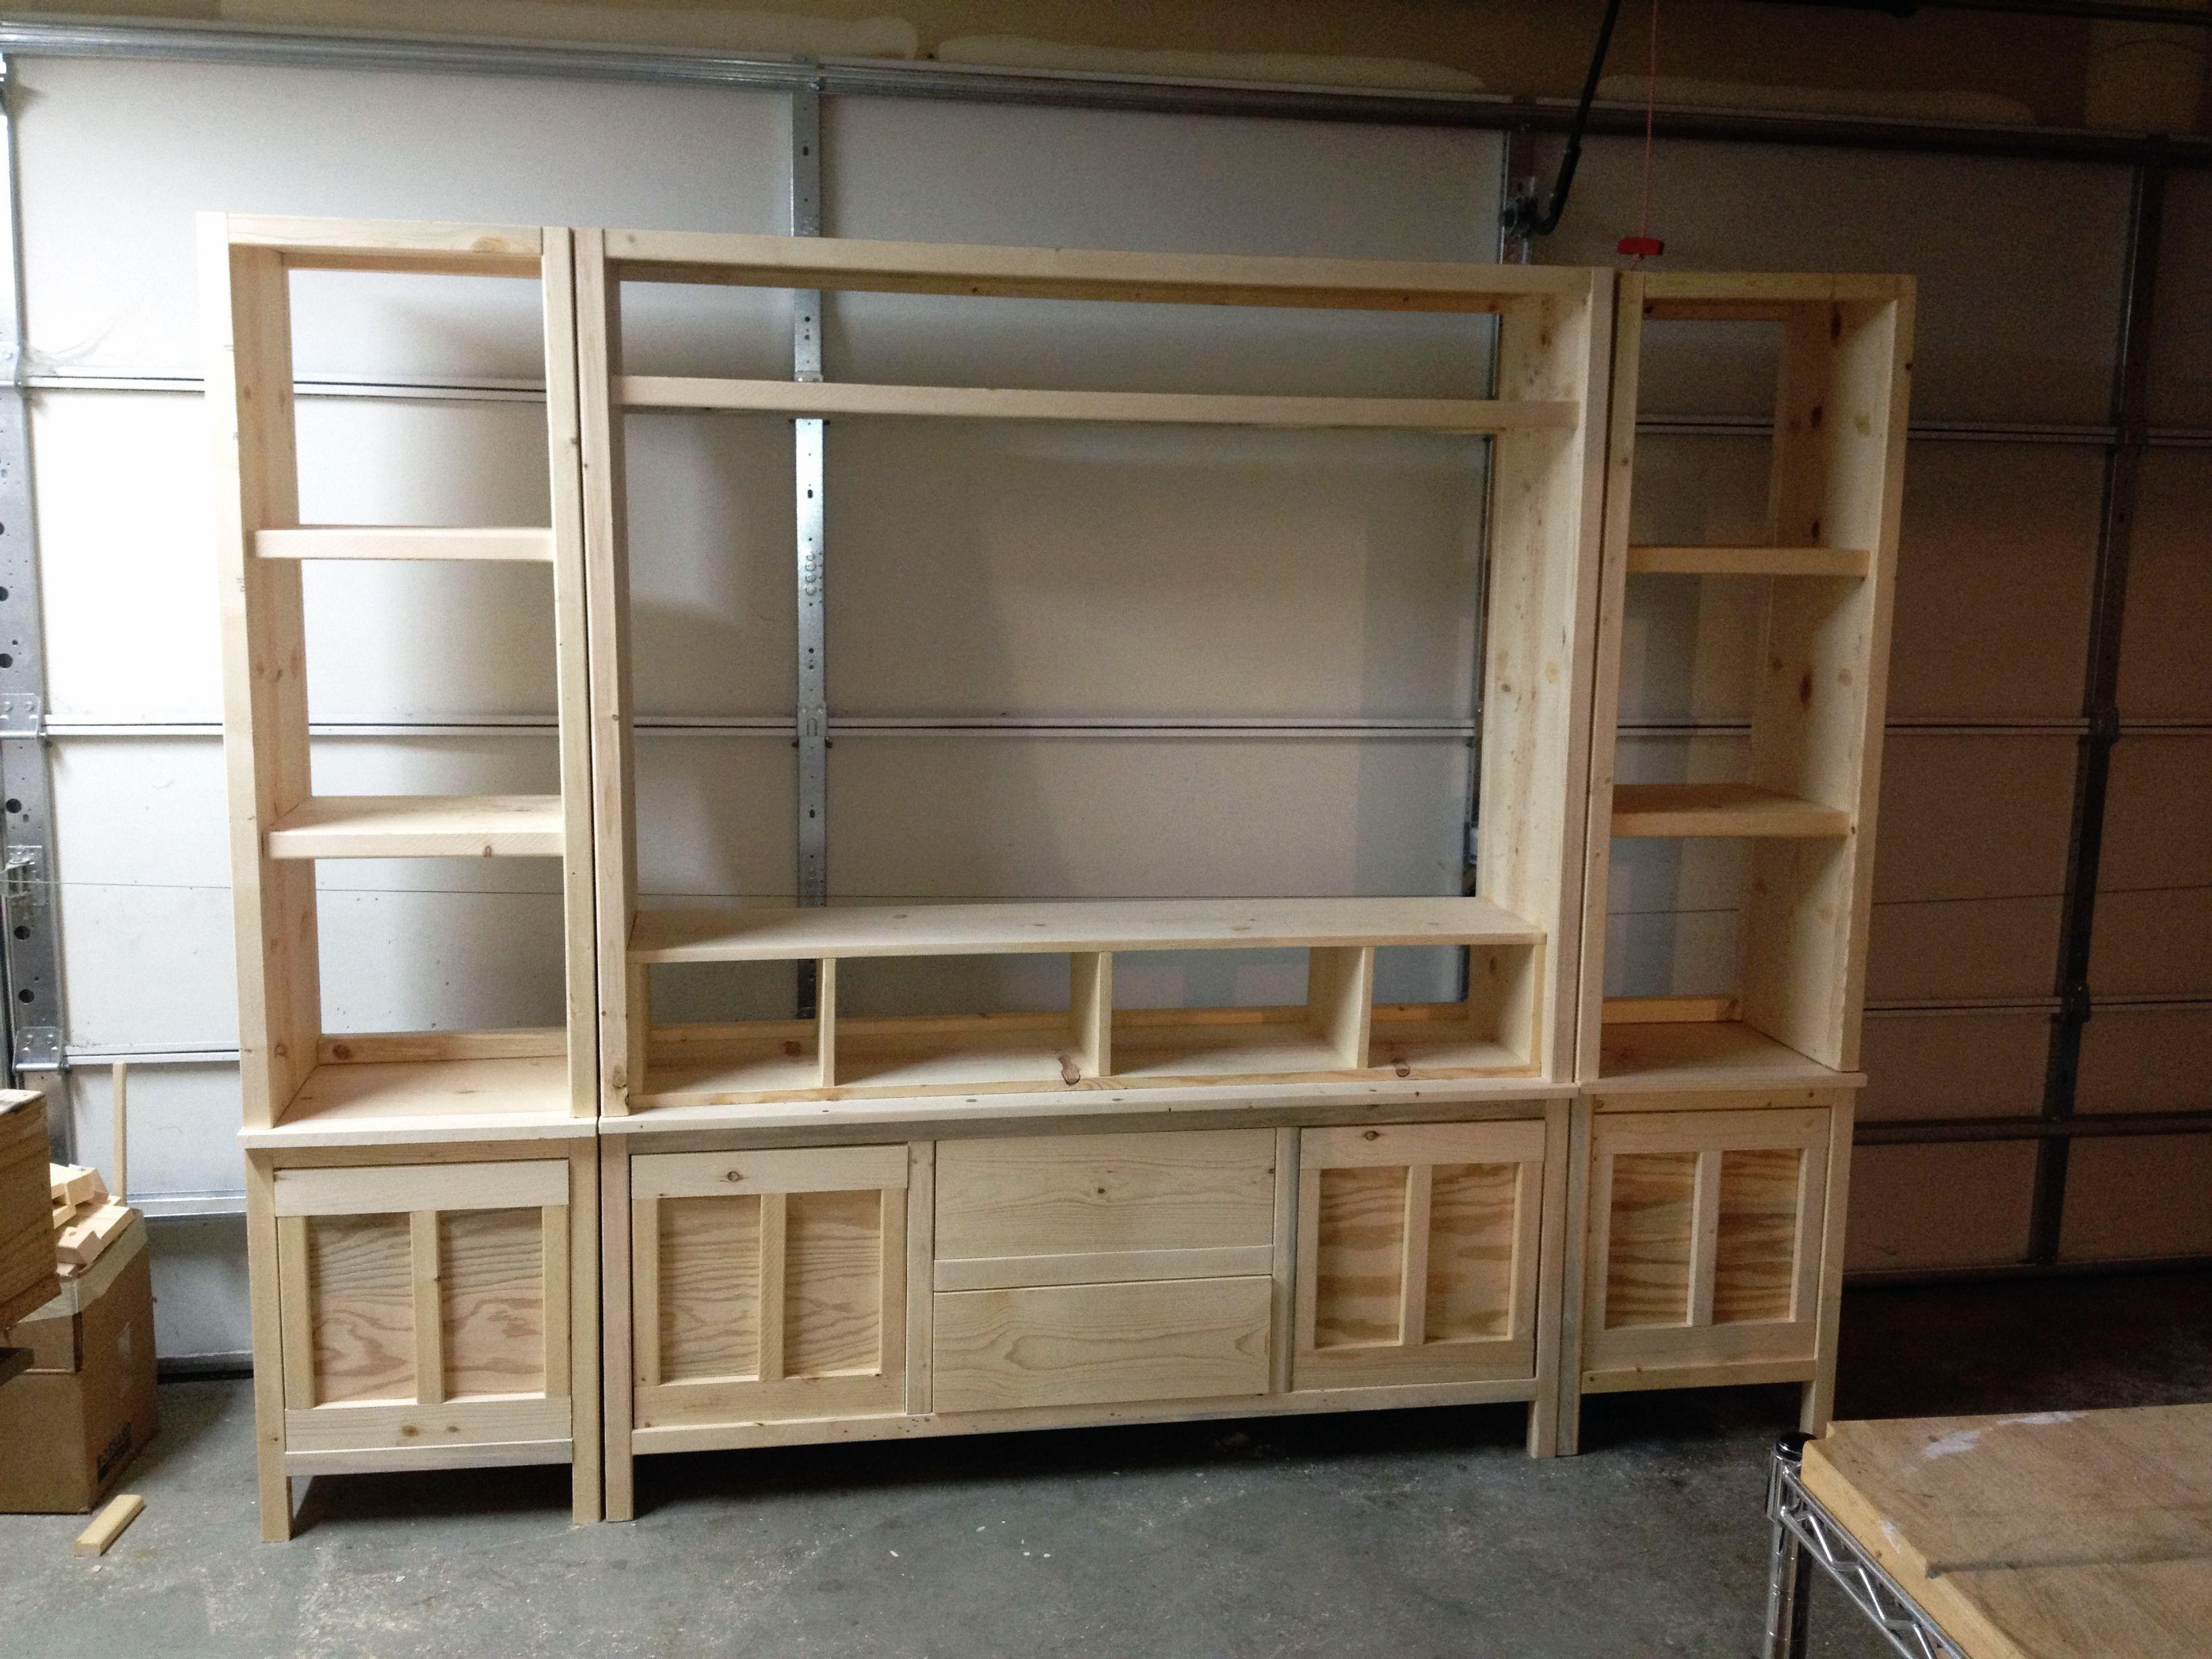 Home entertainment furniture plans Kompan home home plan – Home Entertainment Furniture Plans